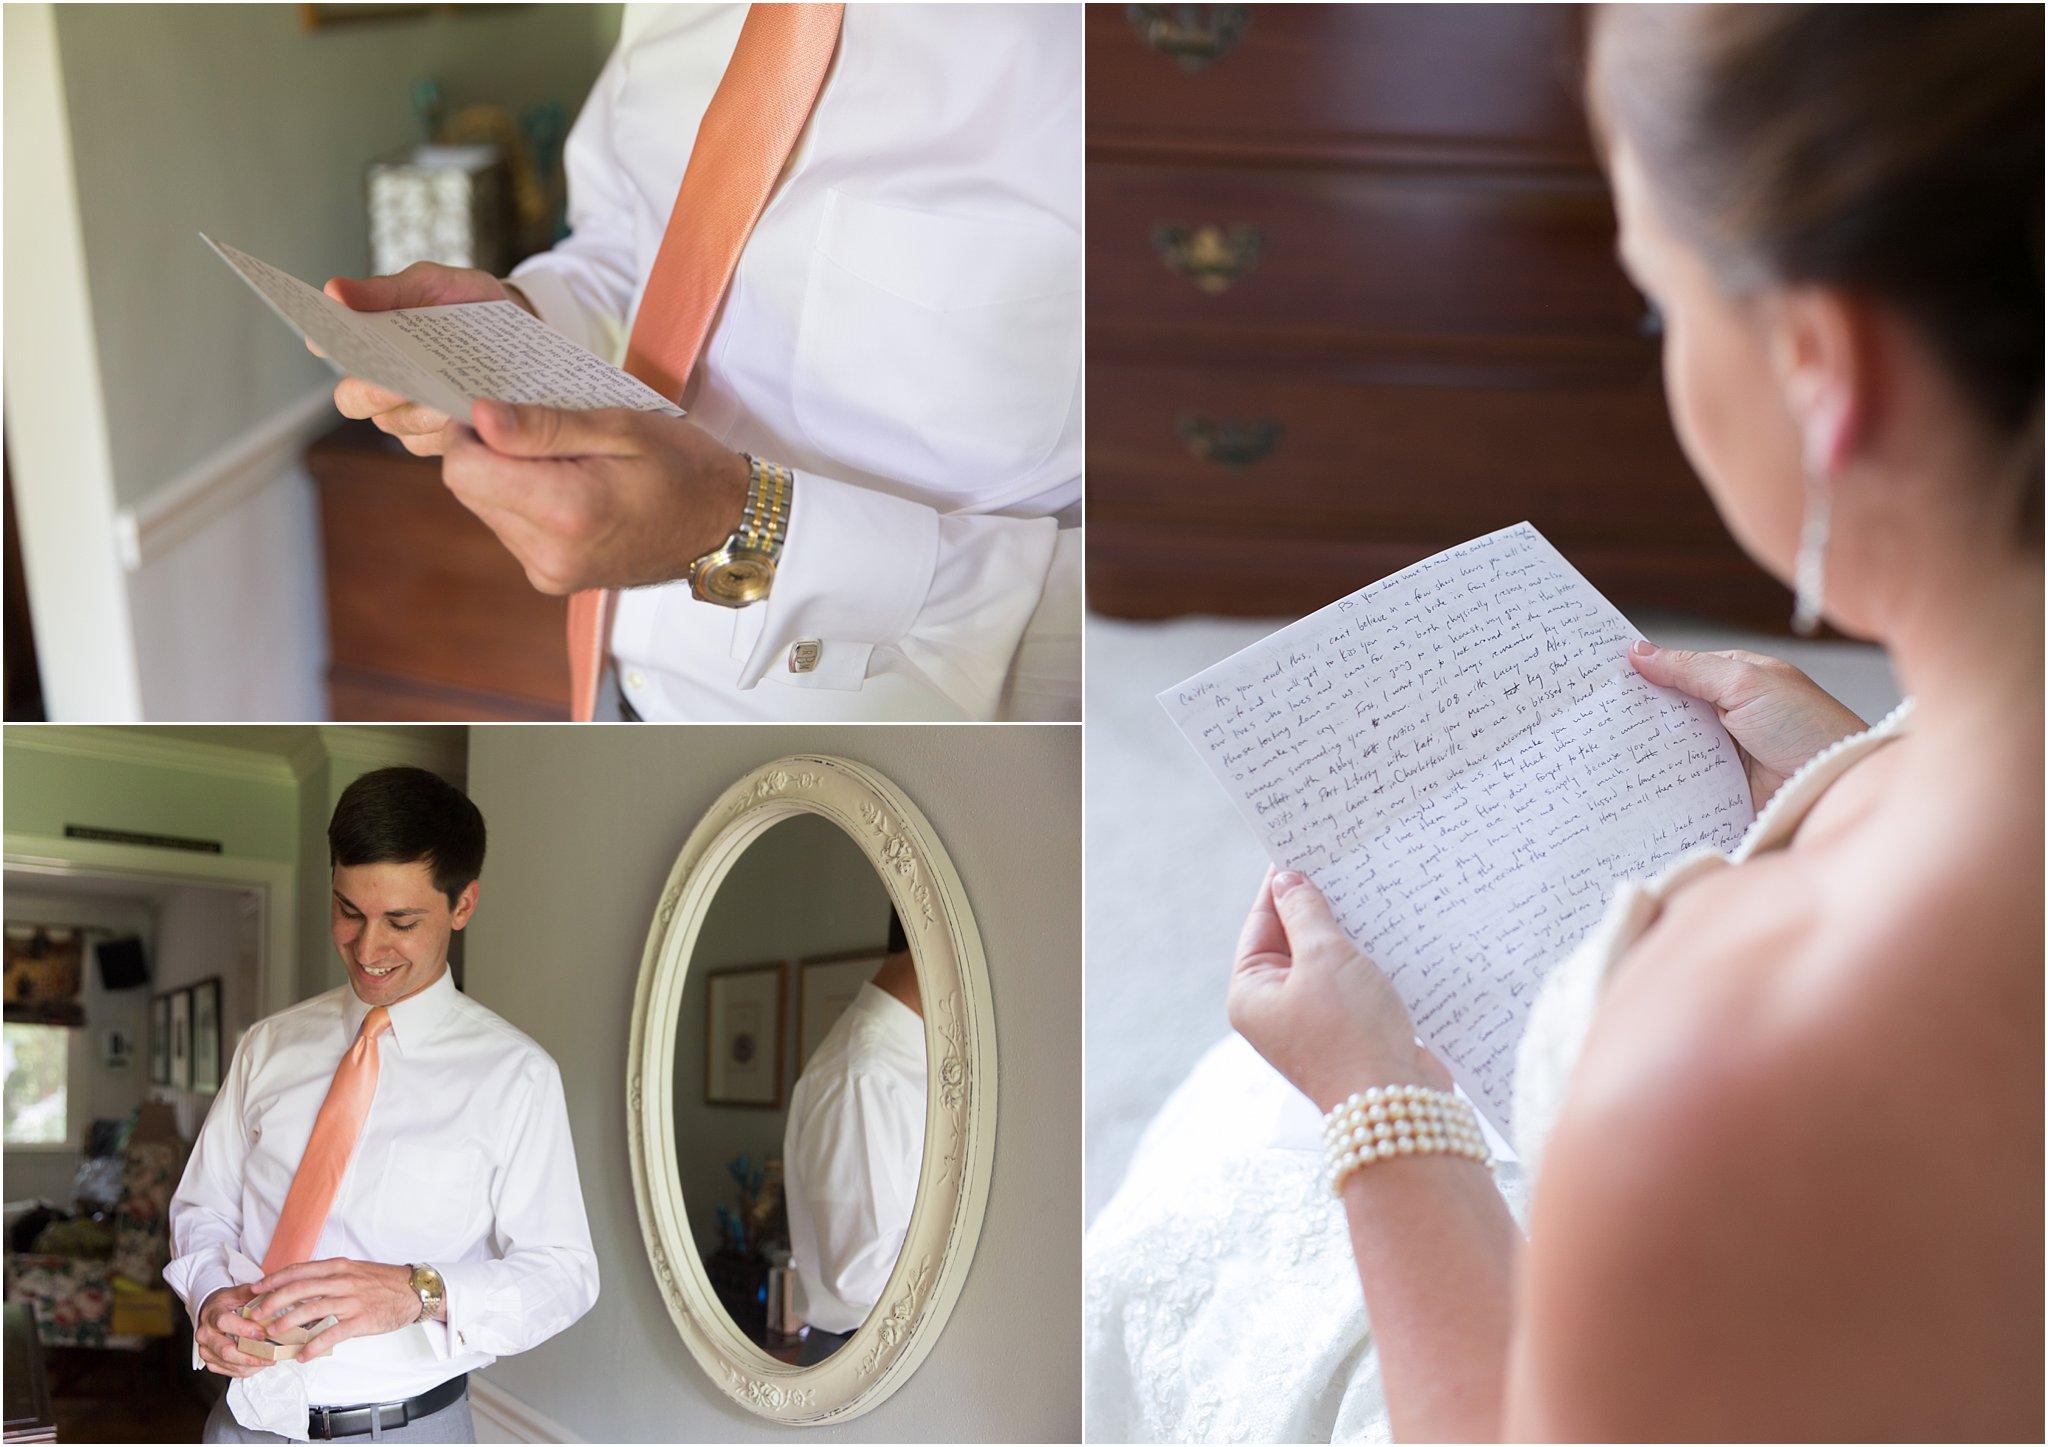 jessica_ryan_photography_wedding_photography_virginiabeach_virginia_candid_authentic_bride_tips_wedding_planning_tips_bridal_tips_1985